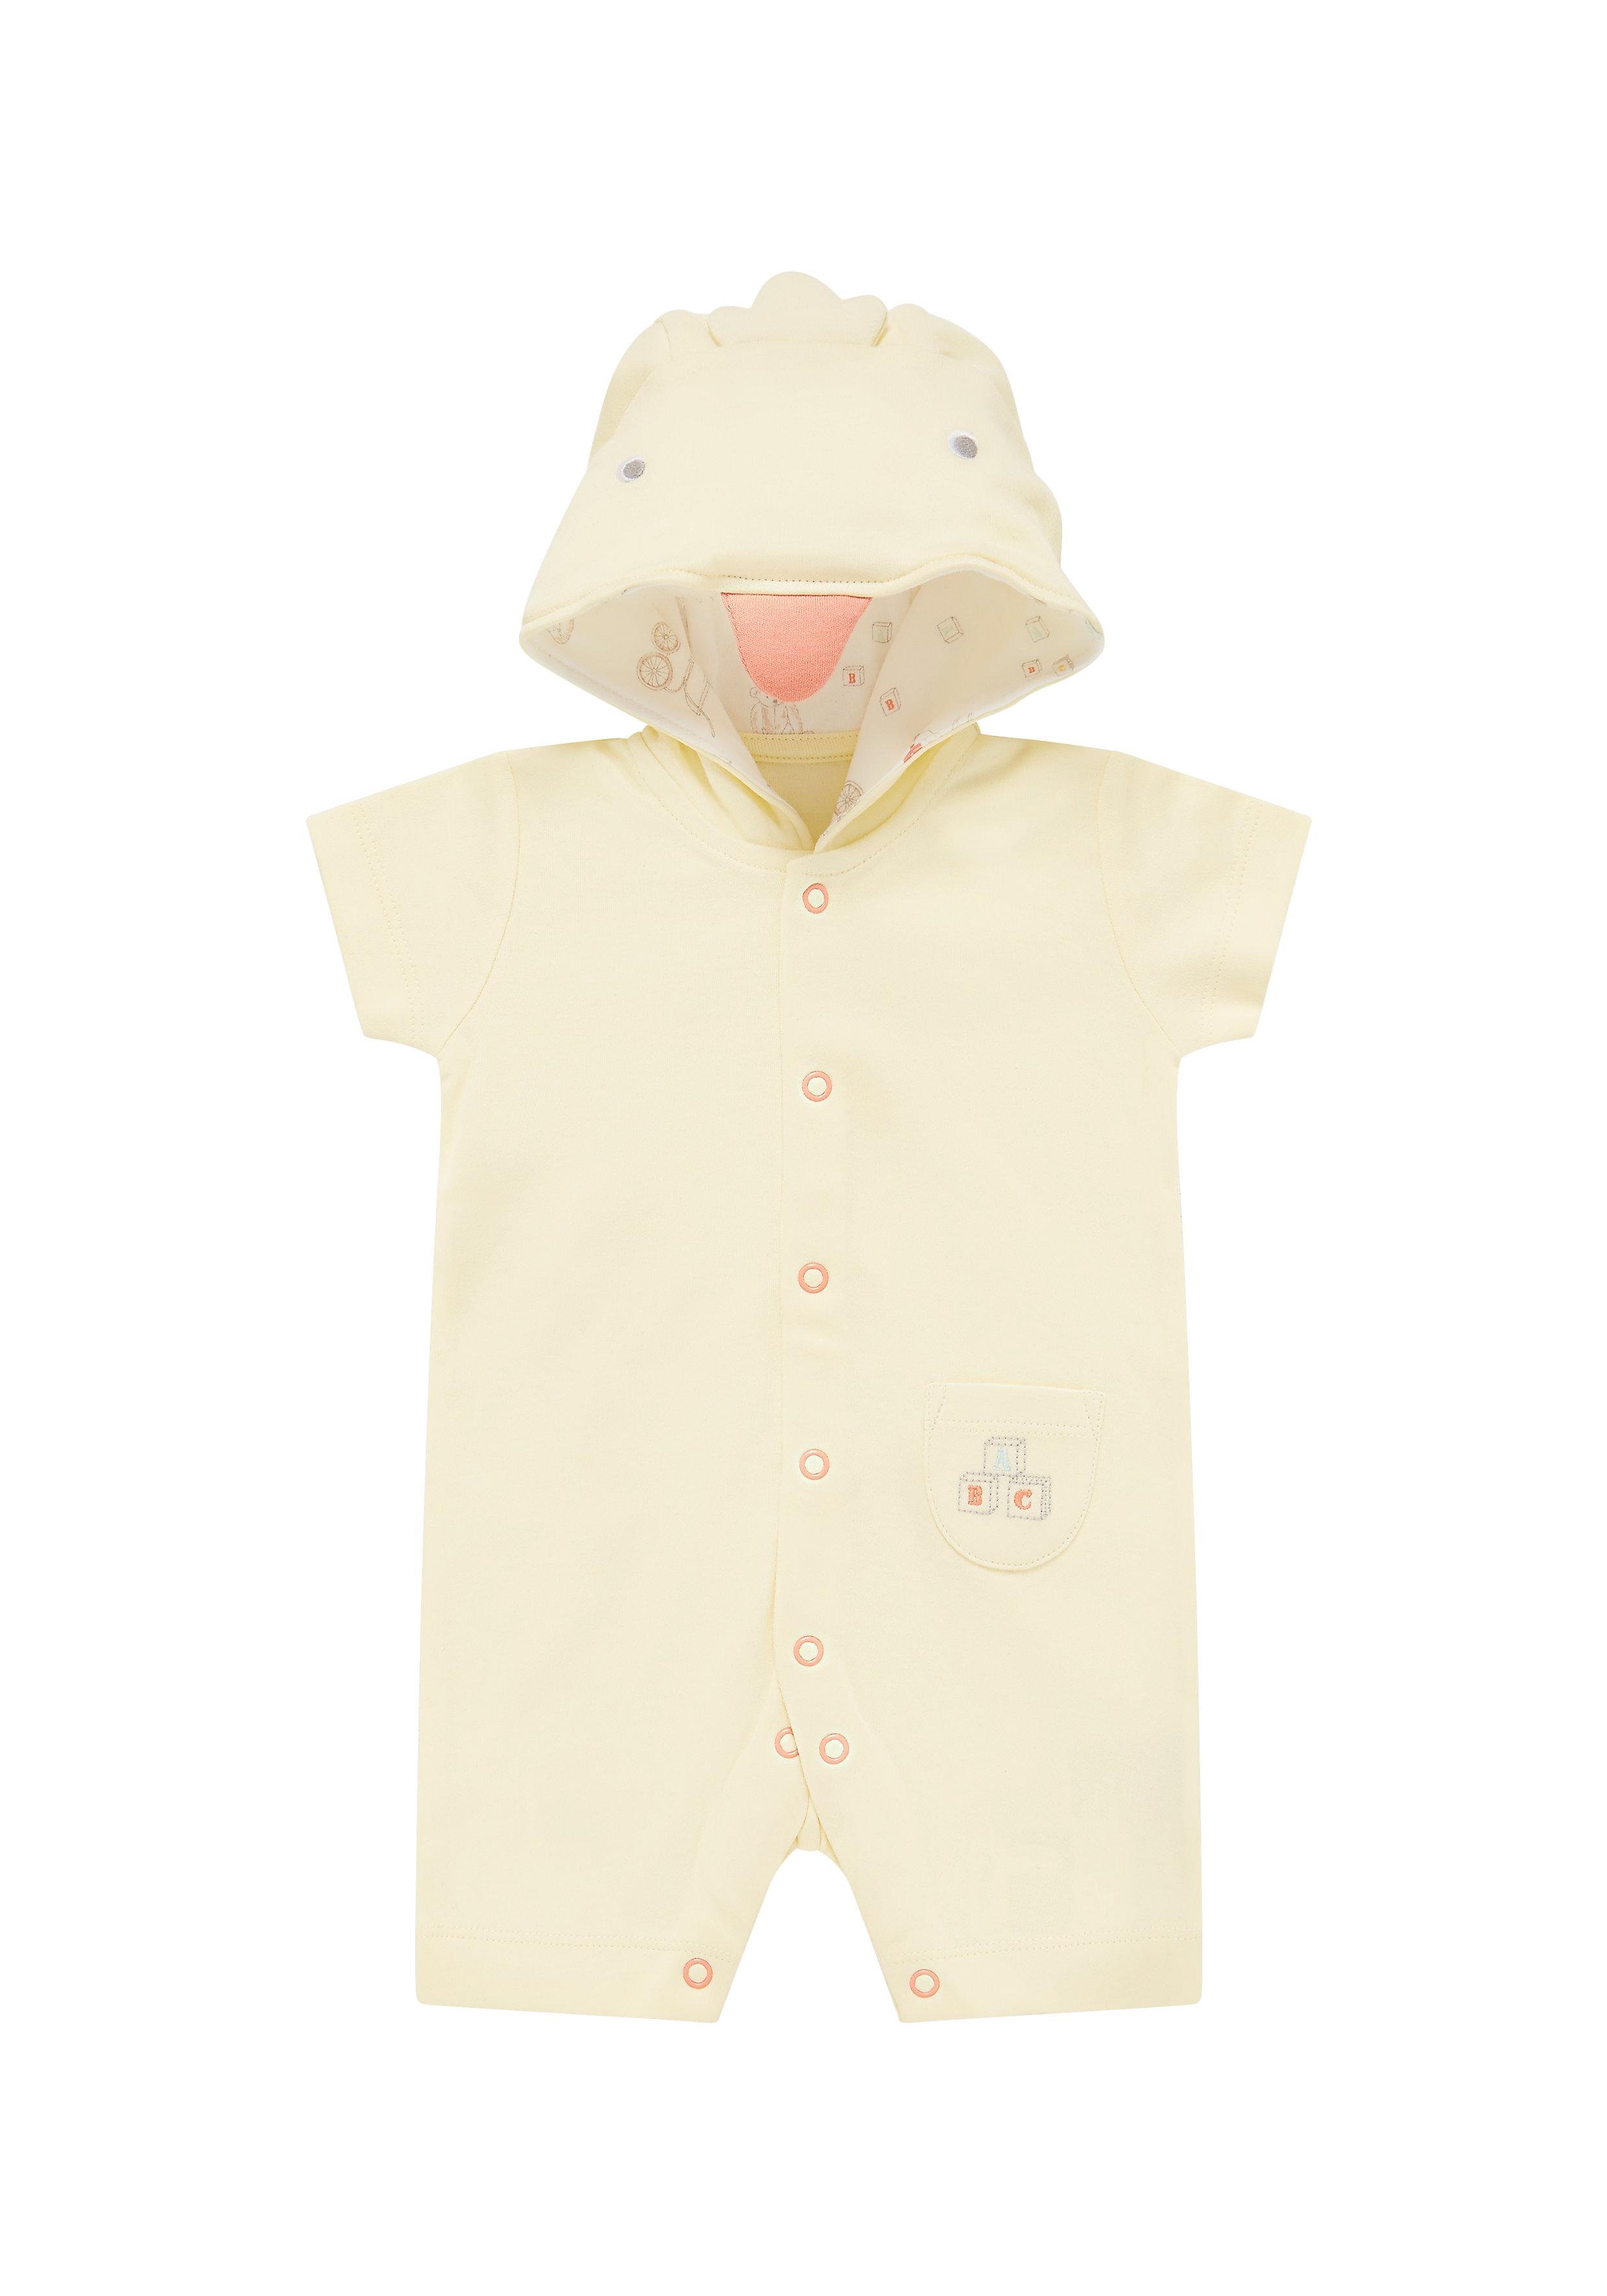 Mothercare | Unisex Dress Up Duck Romper